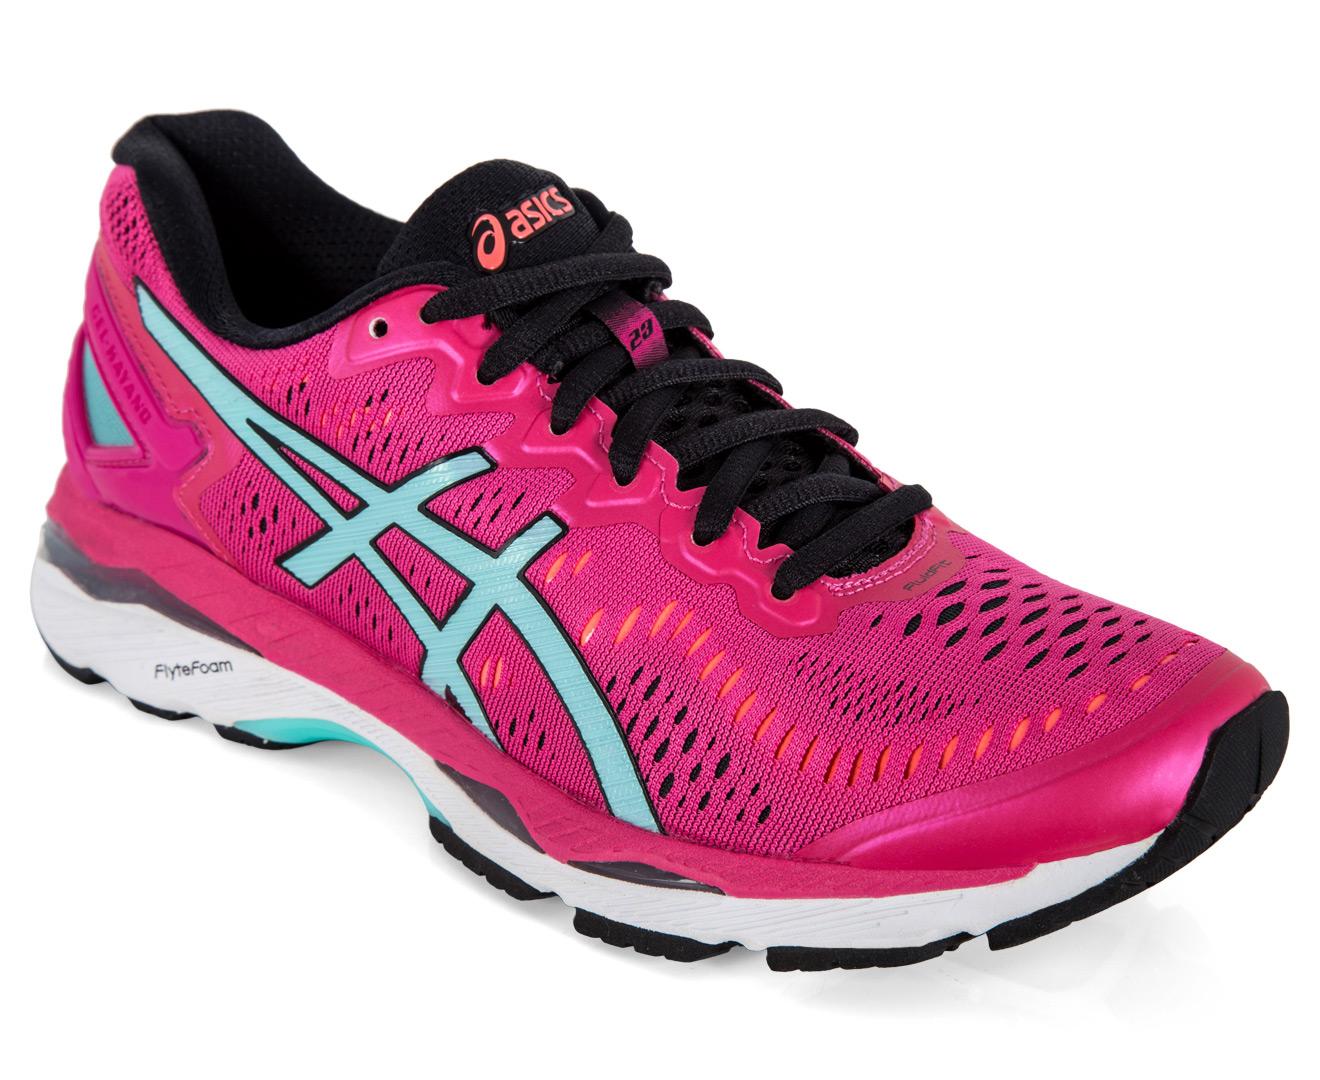 huge discount 79d55 ab5cf ASICS Women's GEL-Kayano 23 Shoe - Sport Pink/Aruba Blue/Flash Coral